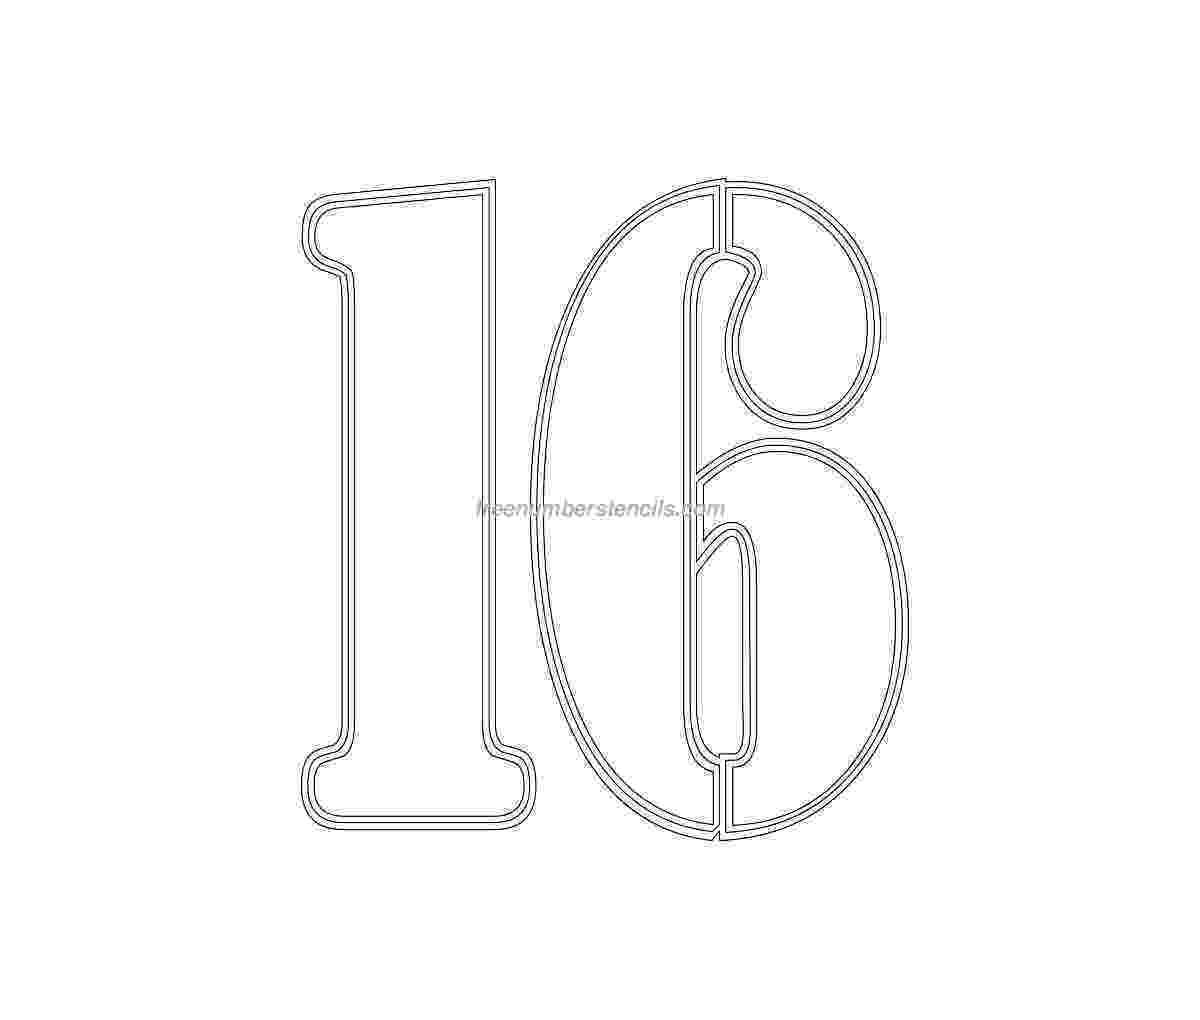 number 16 template number 16 template gallery number 16 template